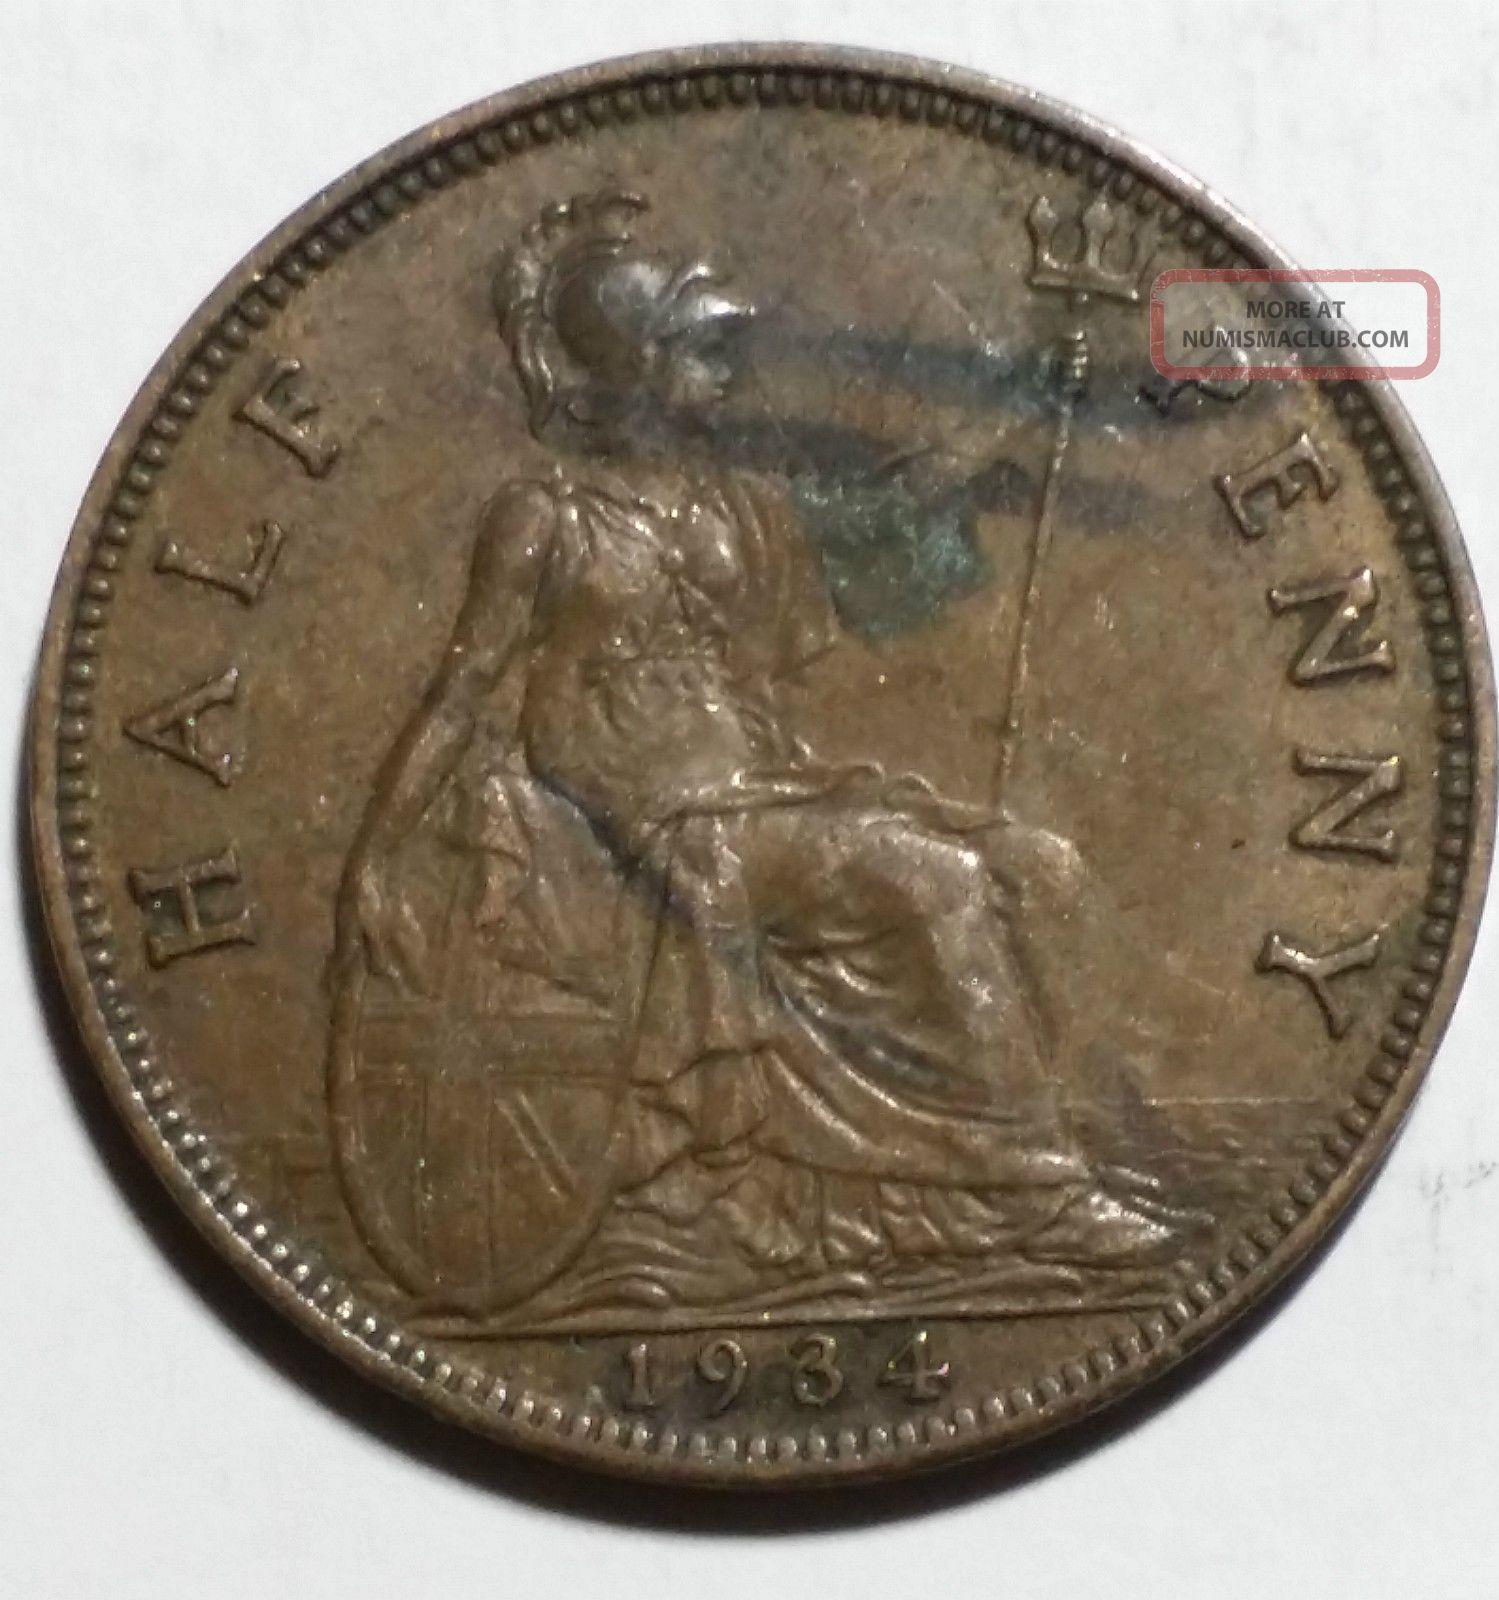 1934 half penny coin value